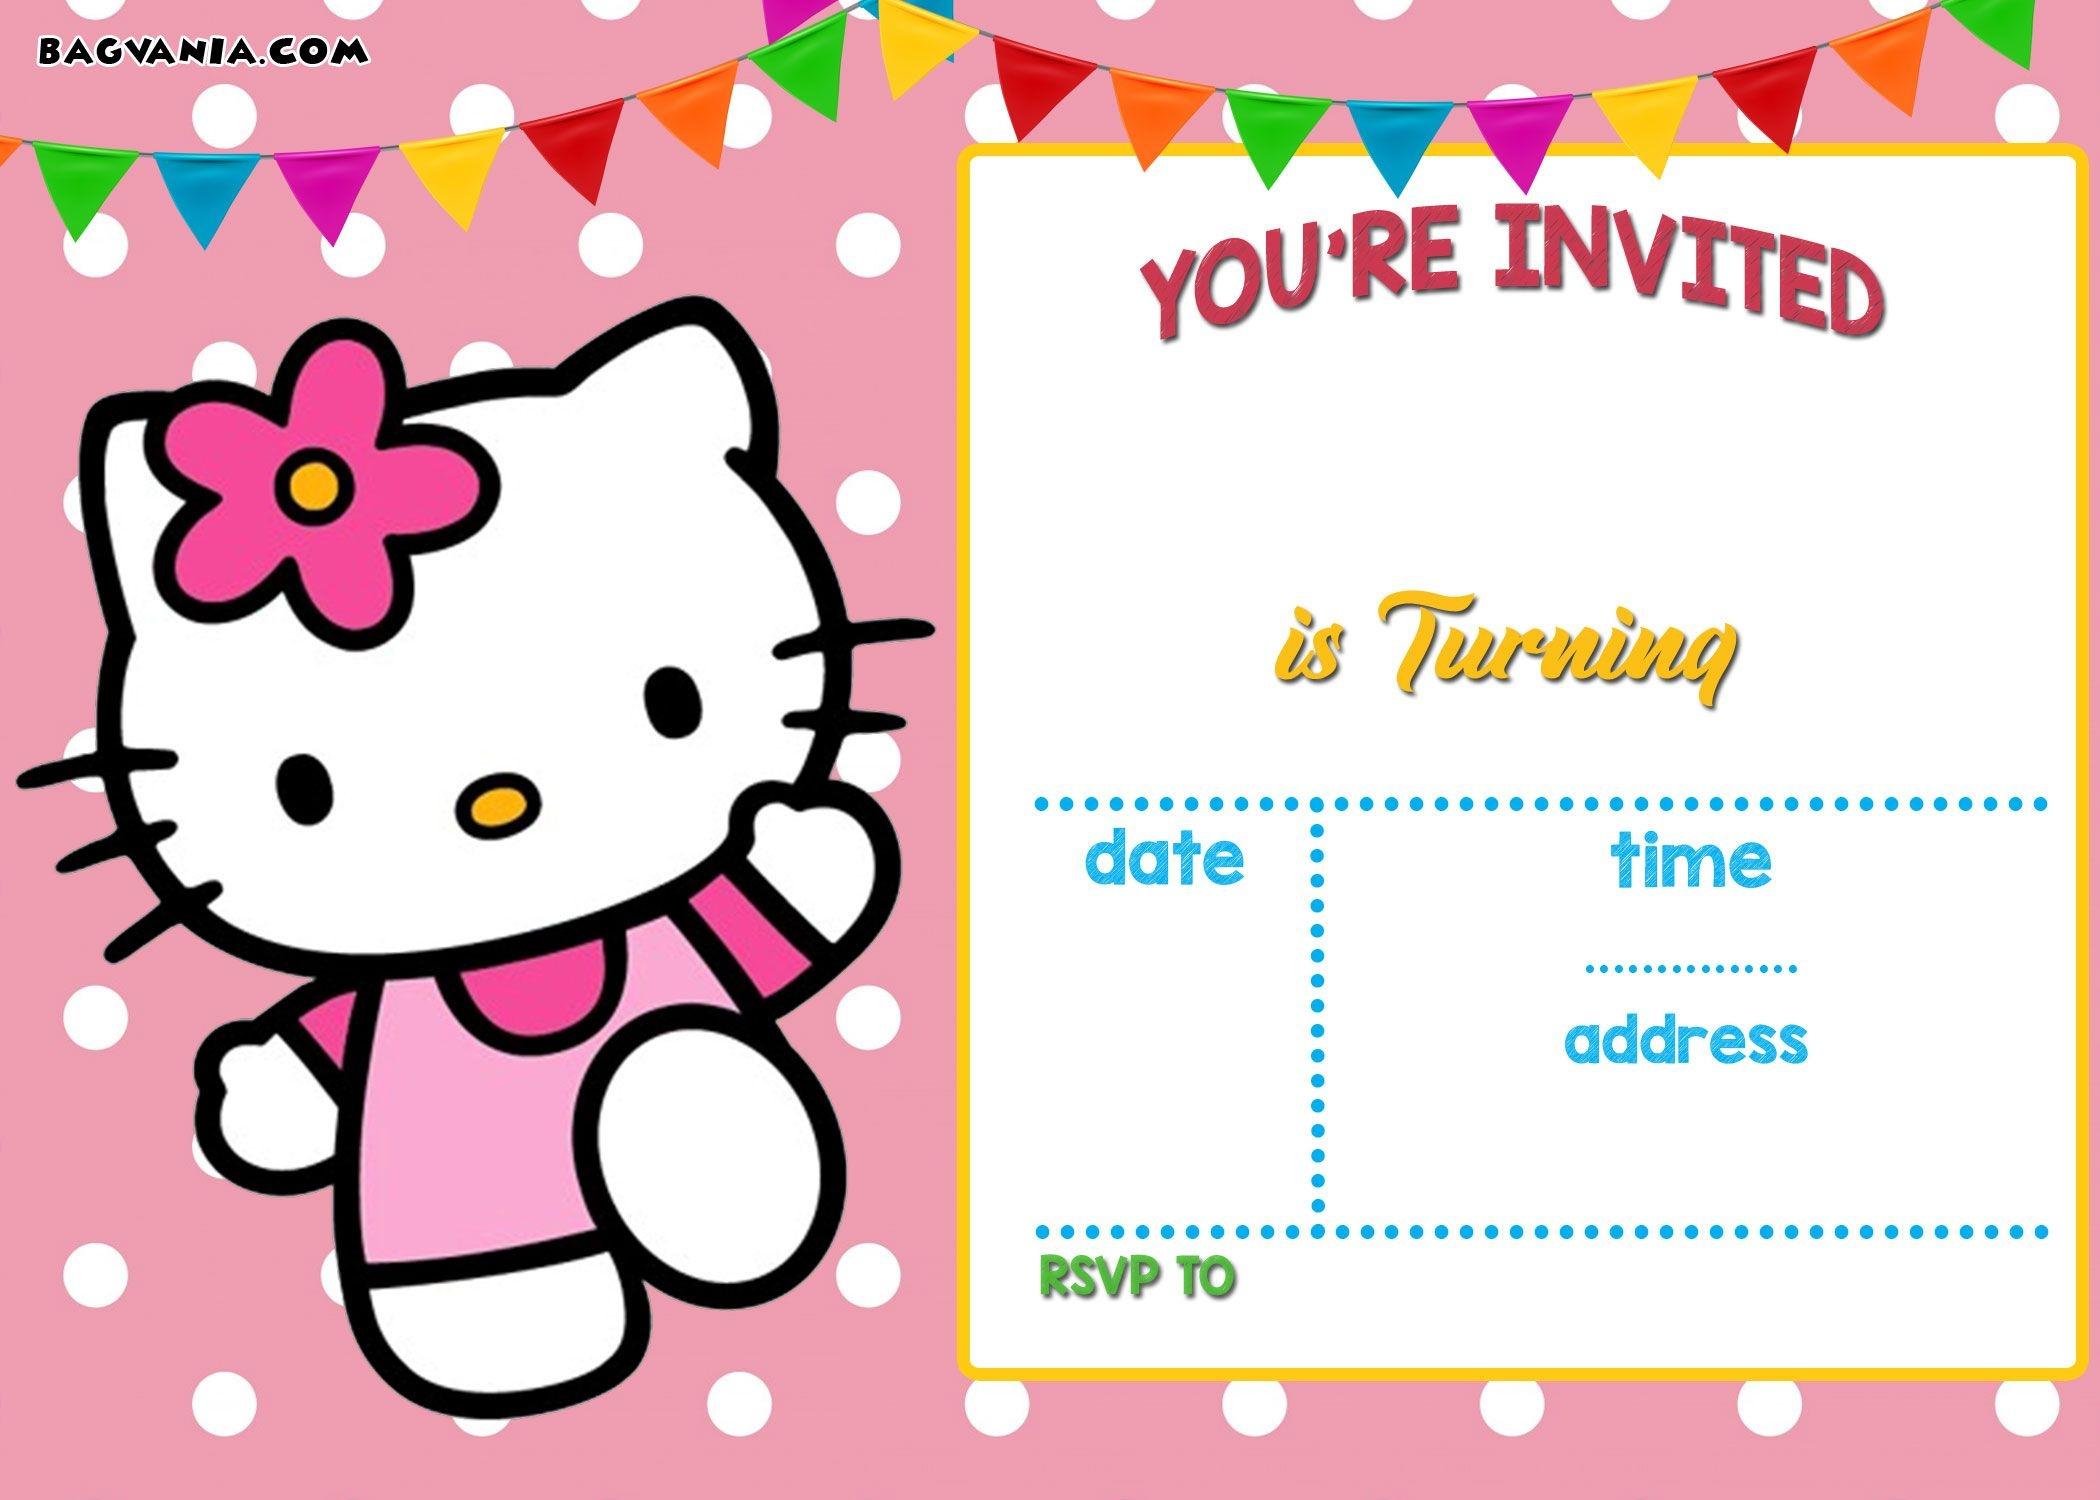 Free Hello Kitty Invitation Templates | Free Printable Birthday - Hello Kitty Free Printable Invitations For Birthday